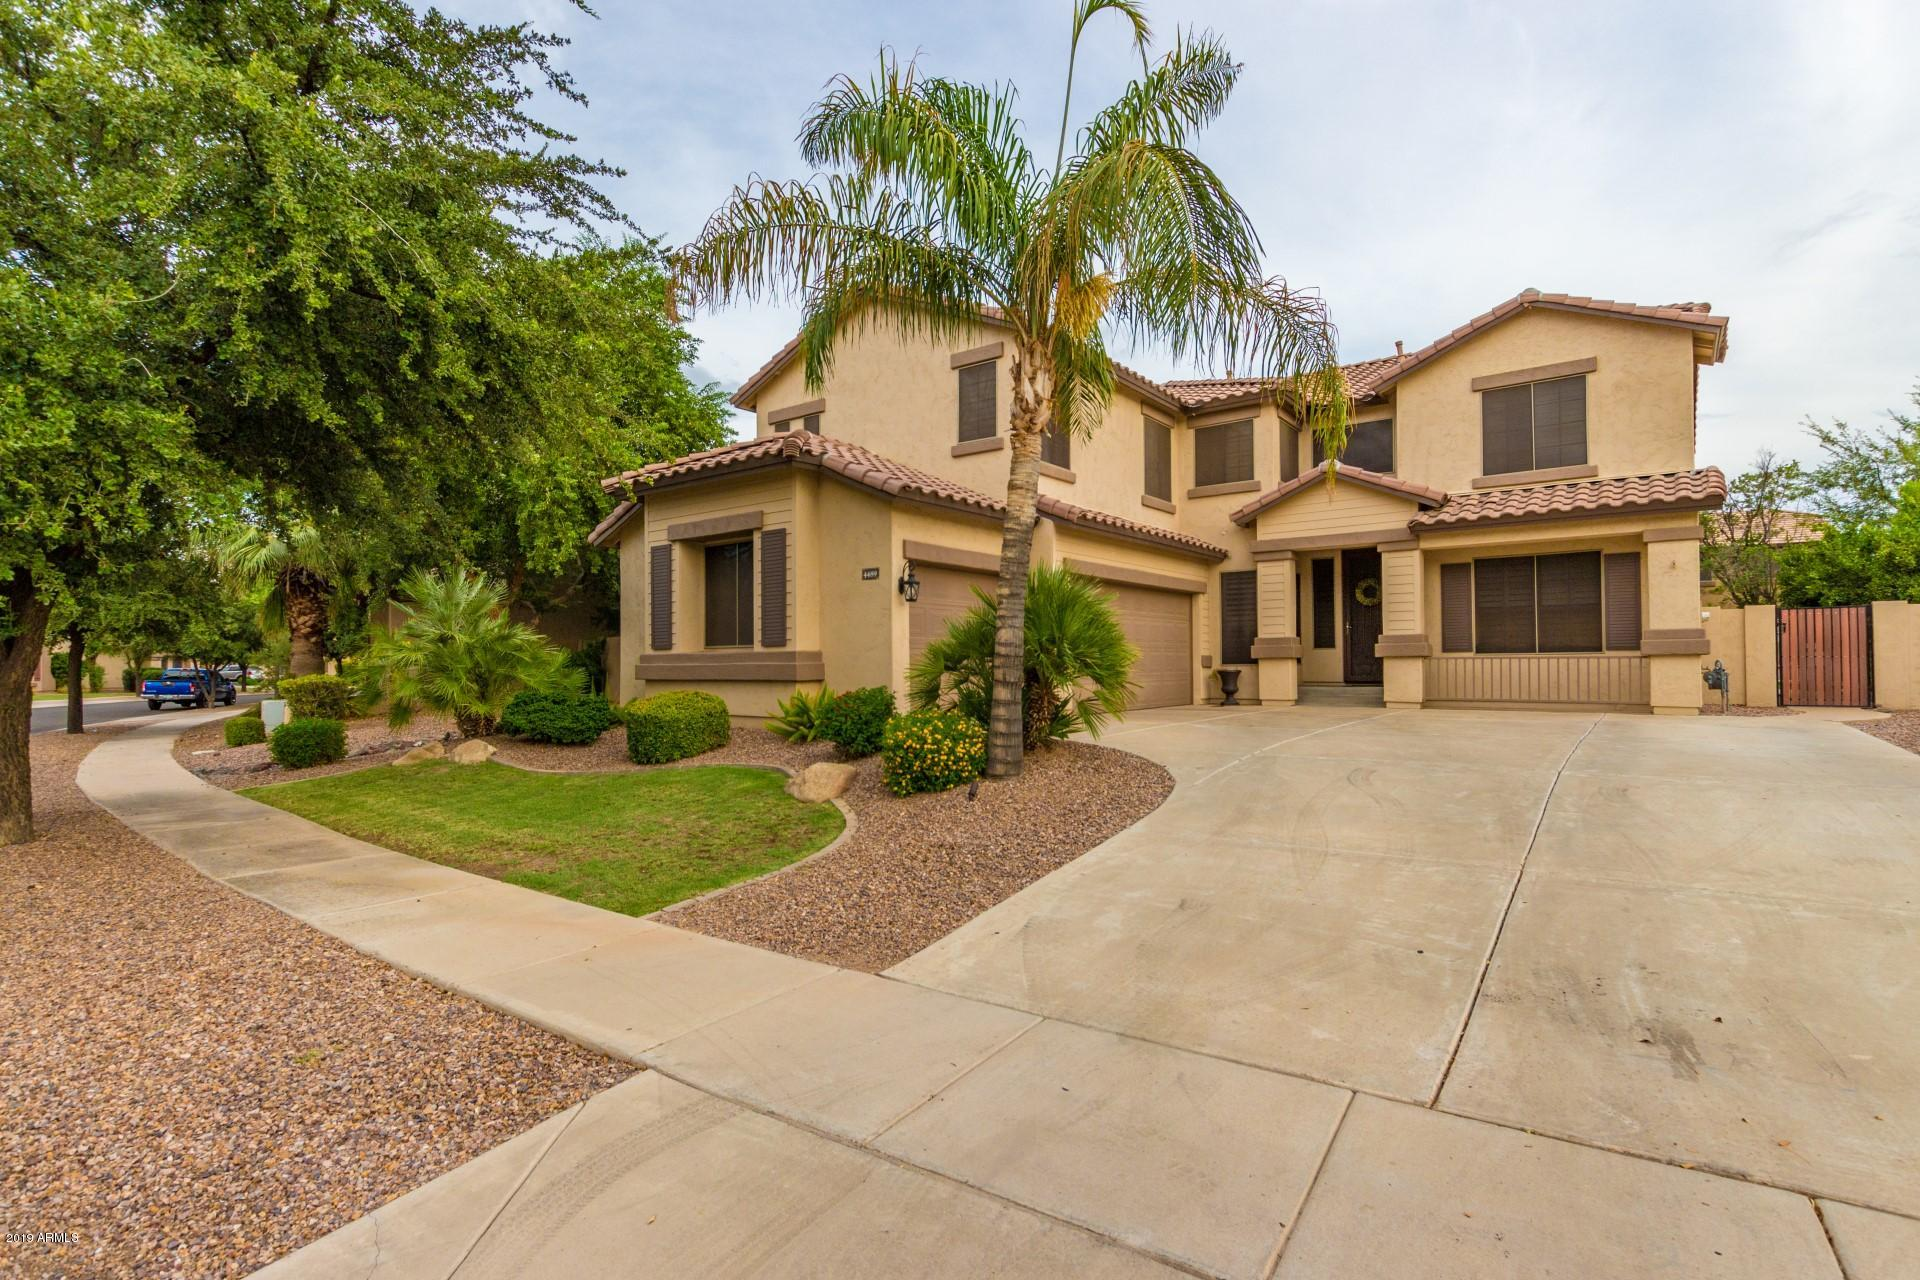 Photo of 4489 E MARSHALL Avenue, Gilbert, AZ 85297